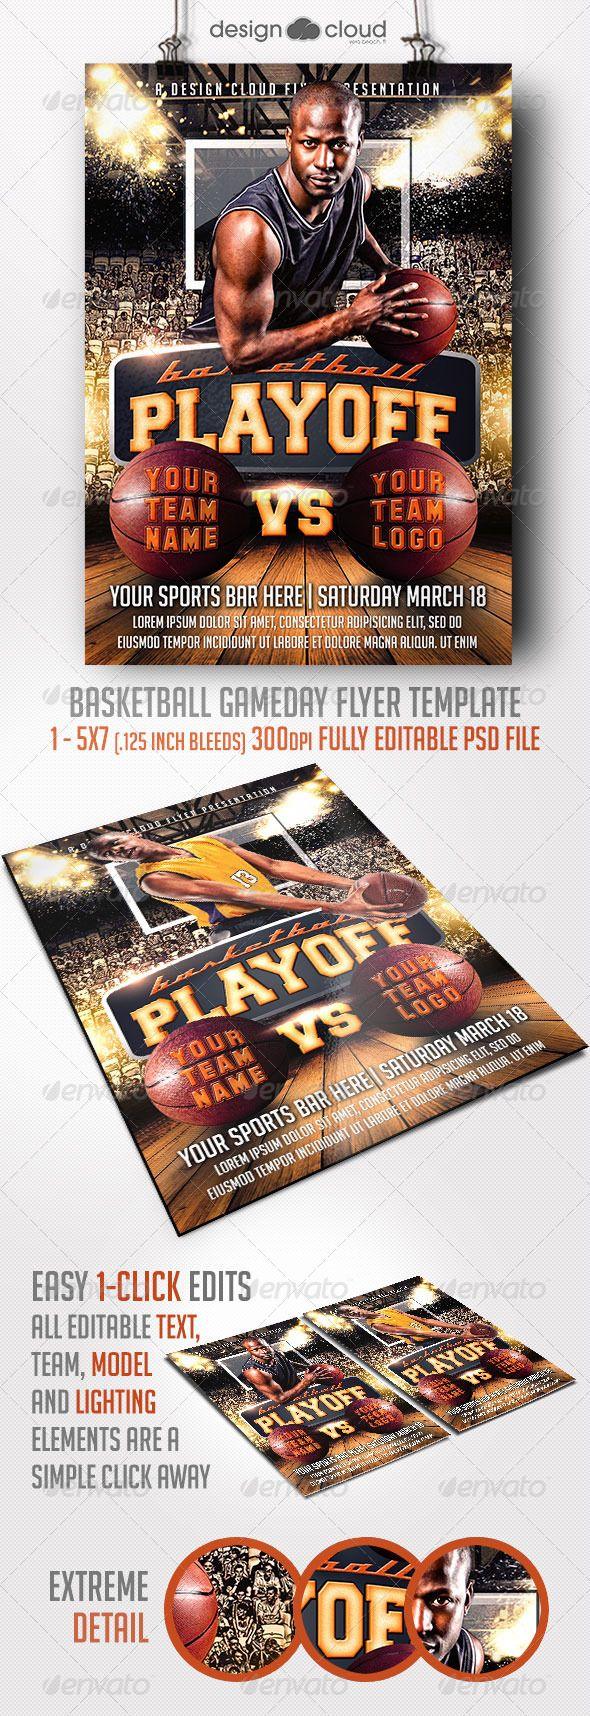 Basketball Game Day Flyer Template | Basketball games ...